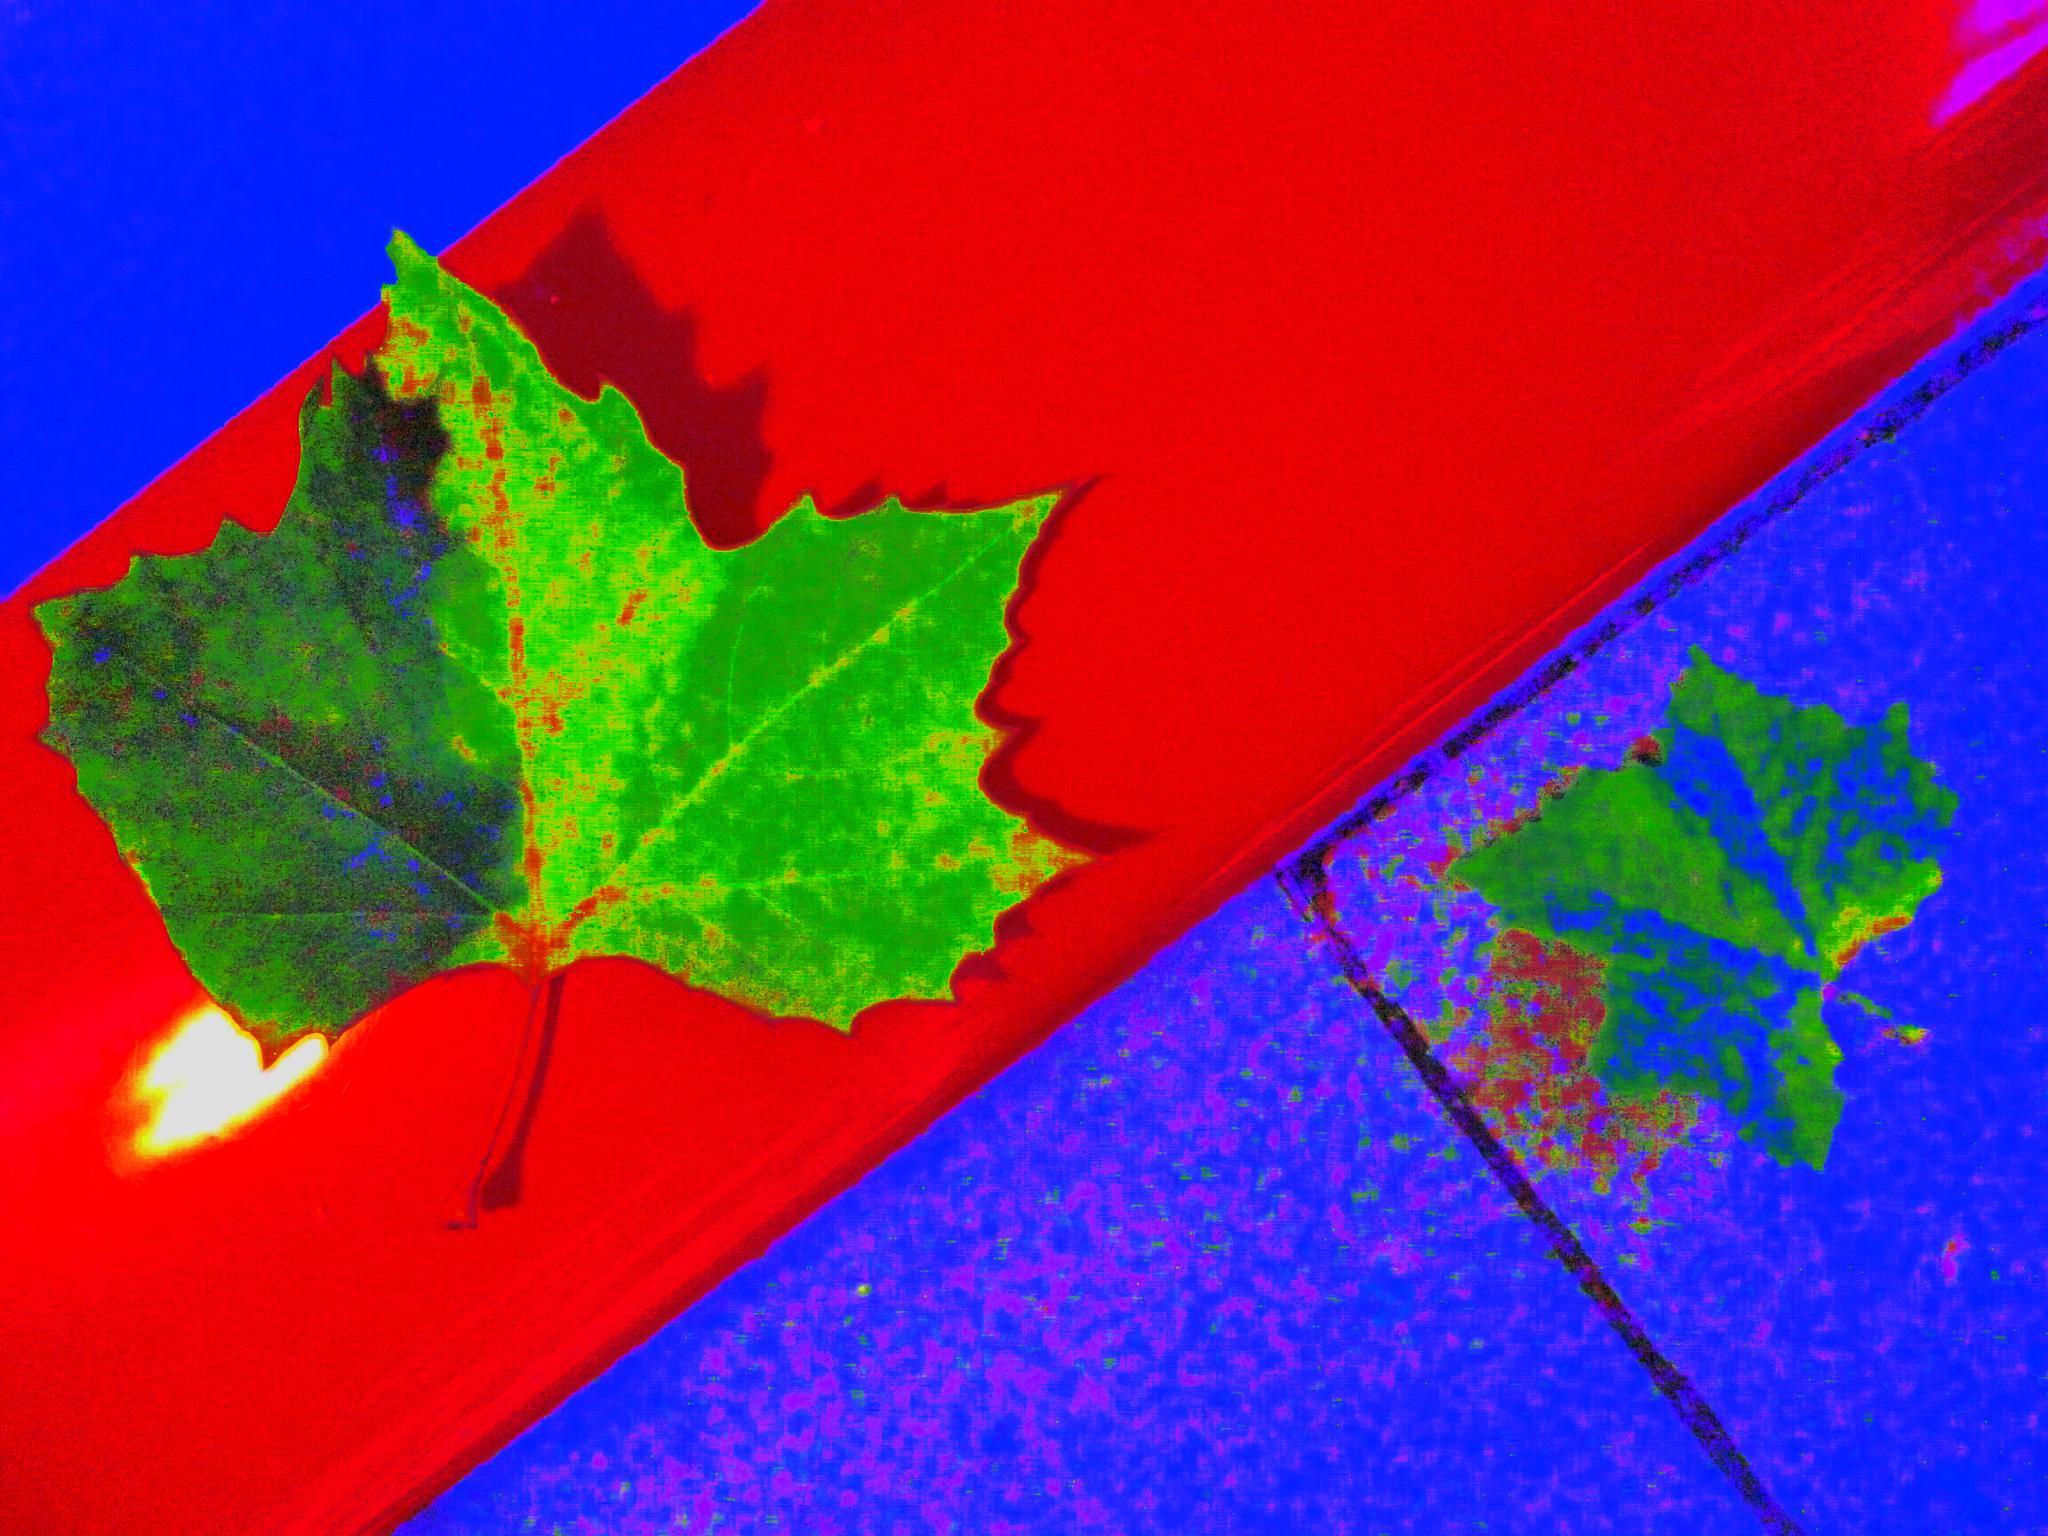 ghost of a leaf by david lewis